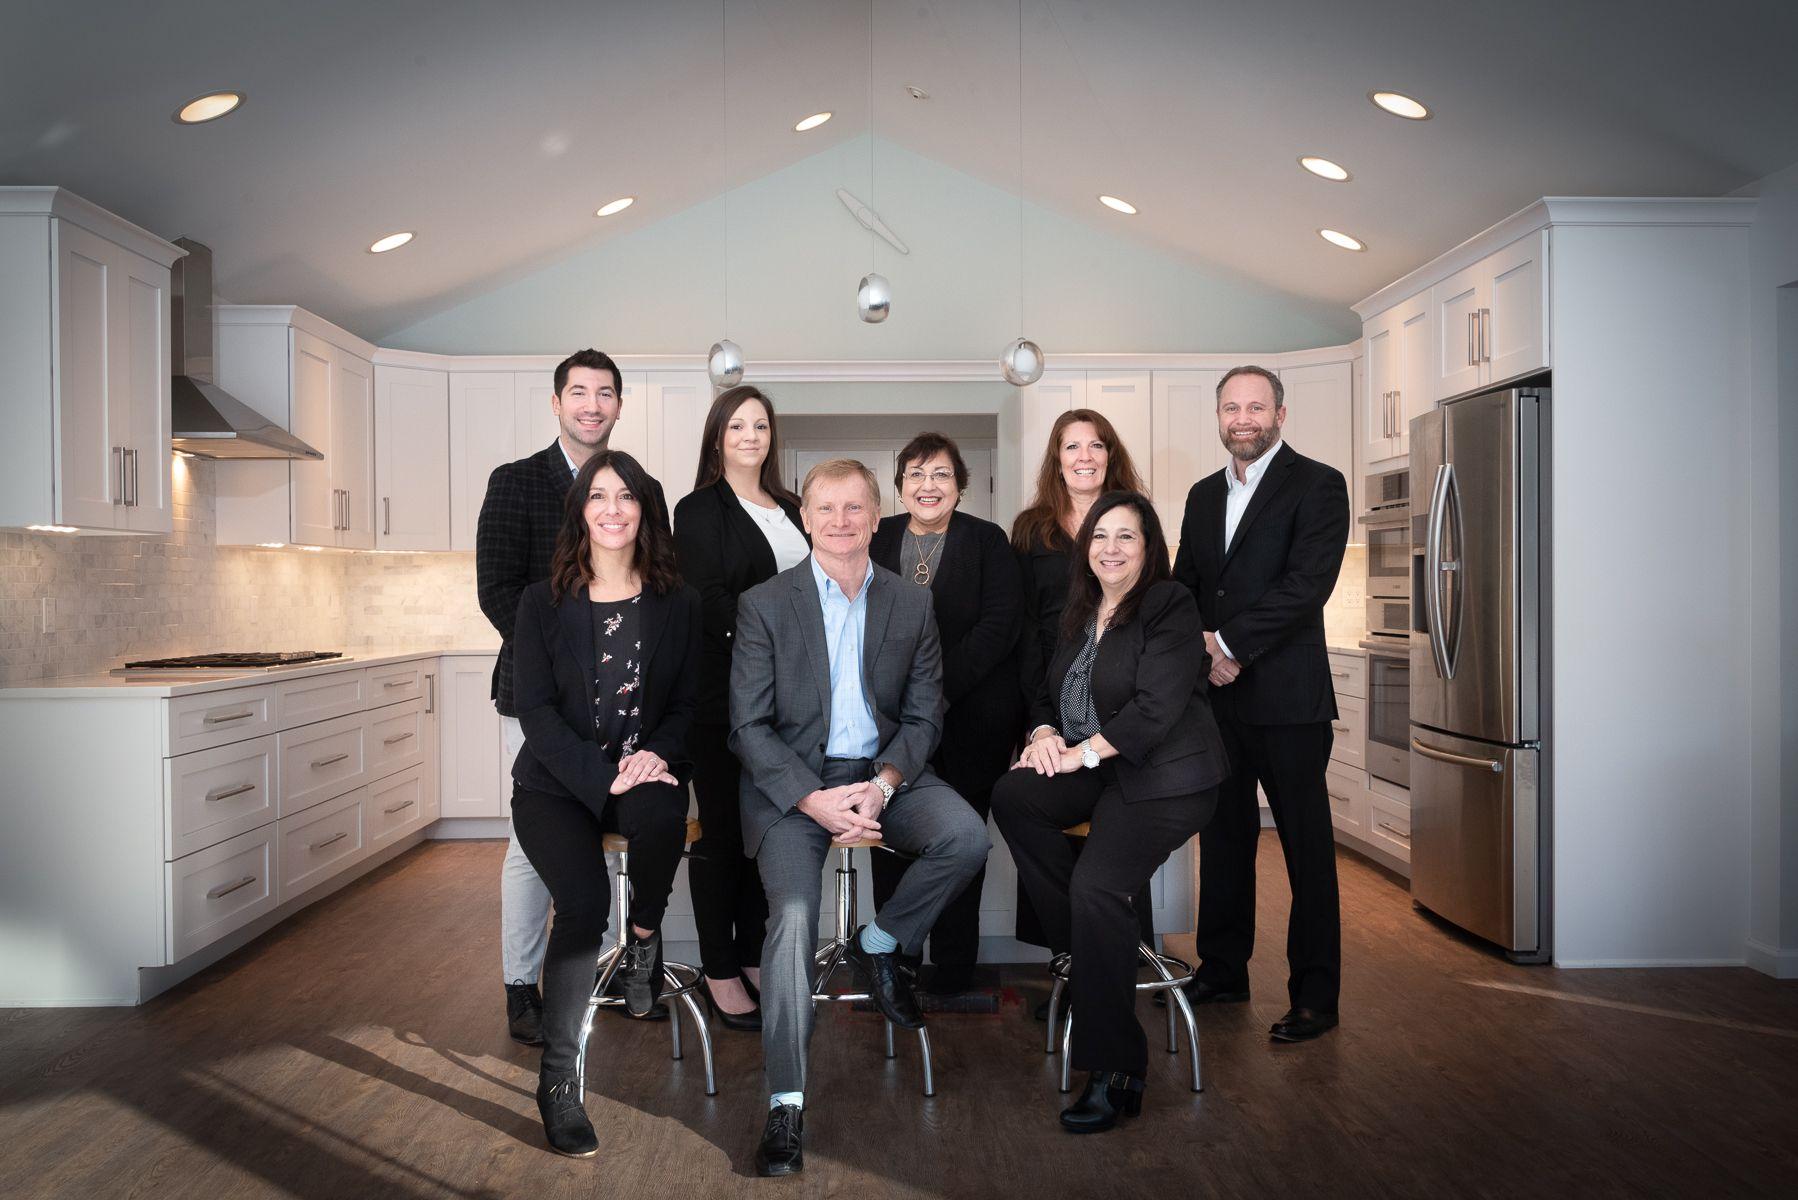 The Bill Heenan Group Realtors